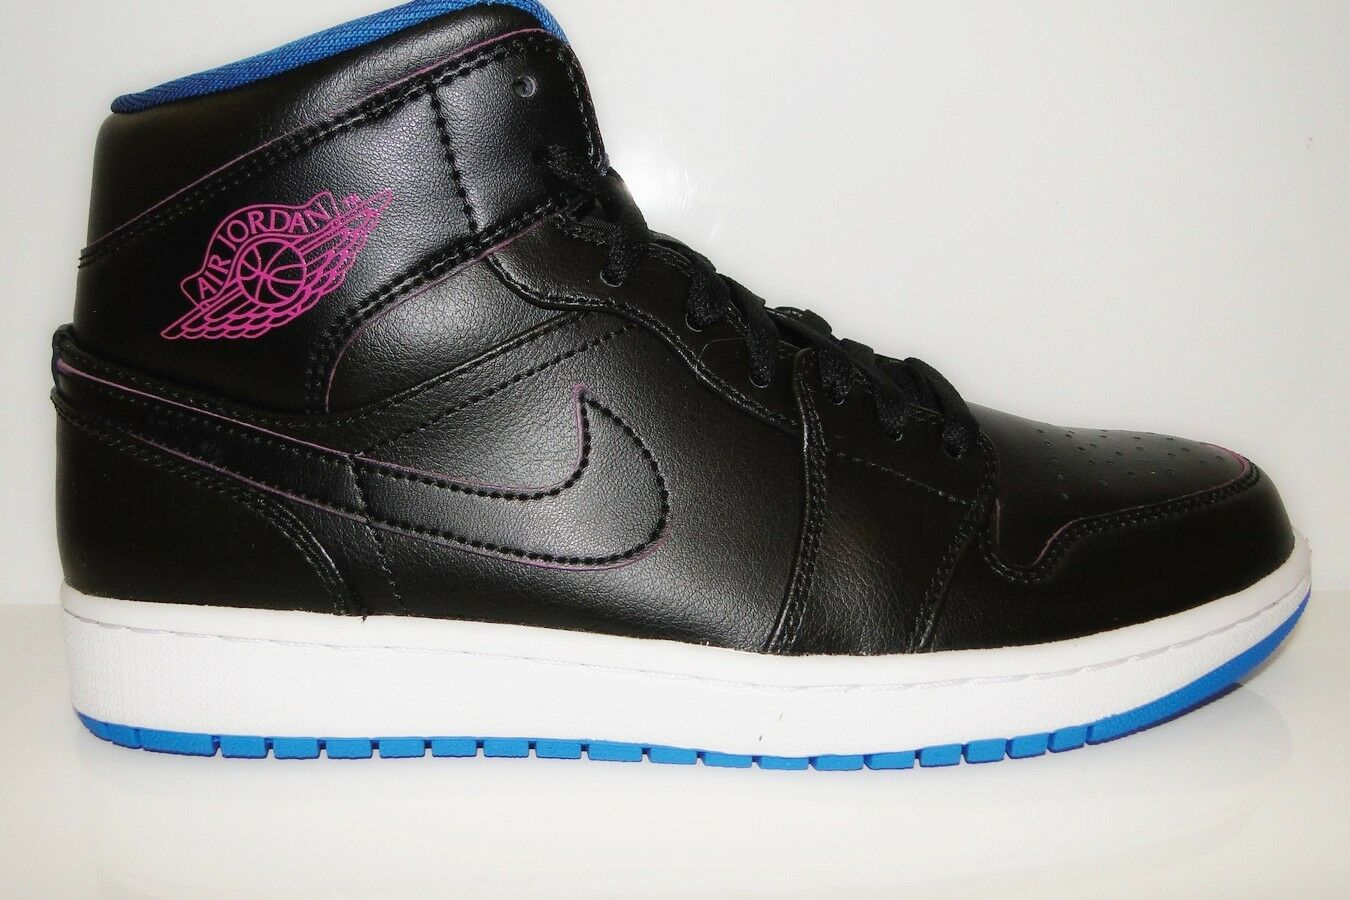 Zapatos de mujer baratos zapatos de mujer Nike Air Jordan a mediados de 1 Botas de baloncesto para hombre Retro-Negra/firepink/Foto Azul